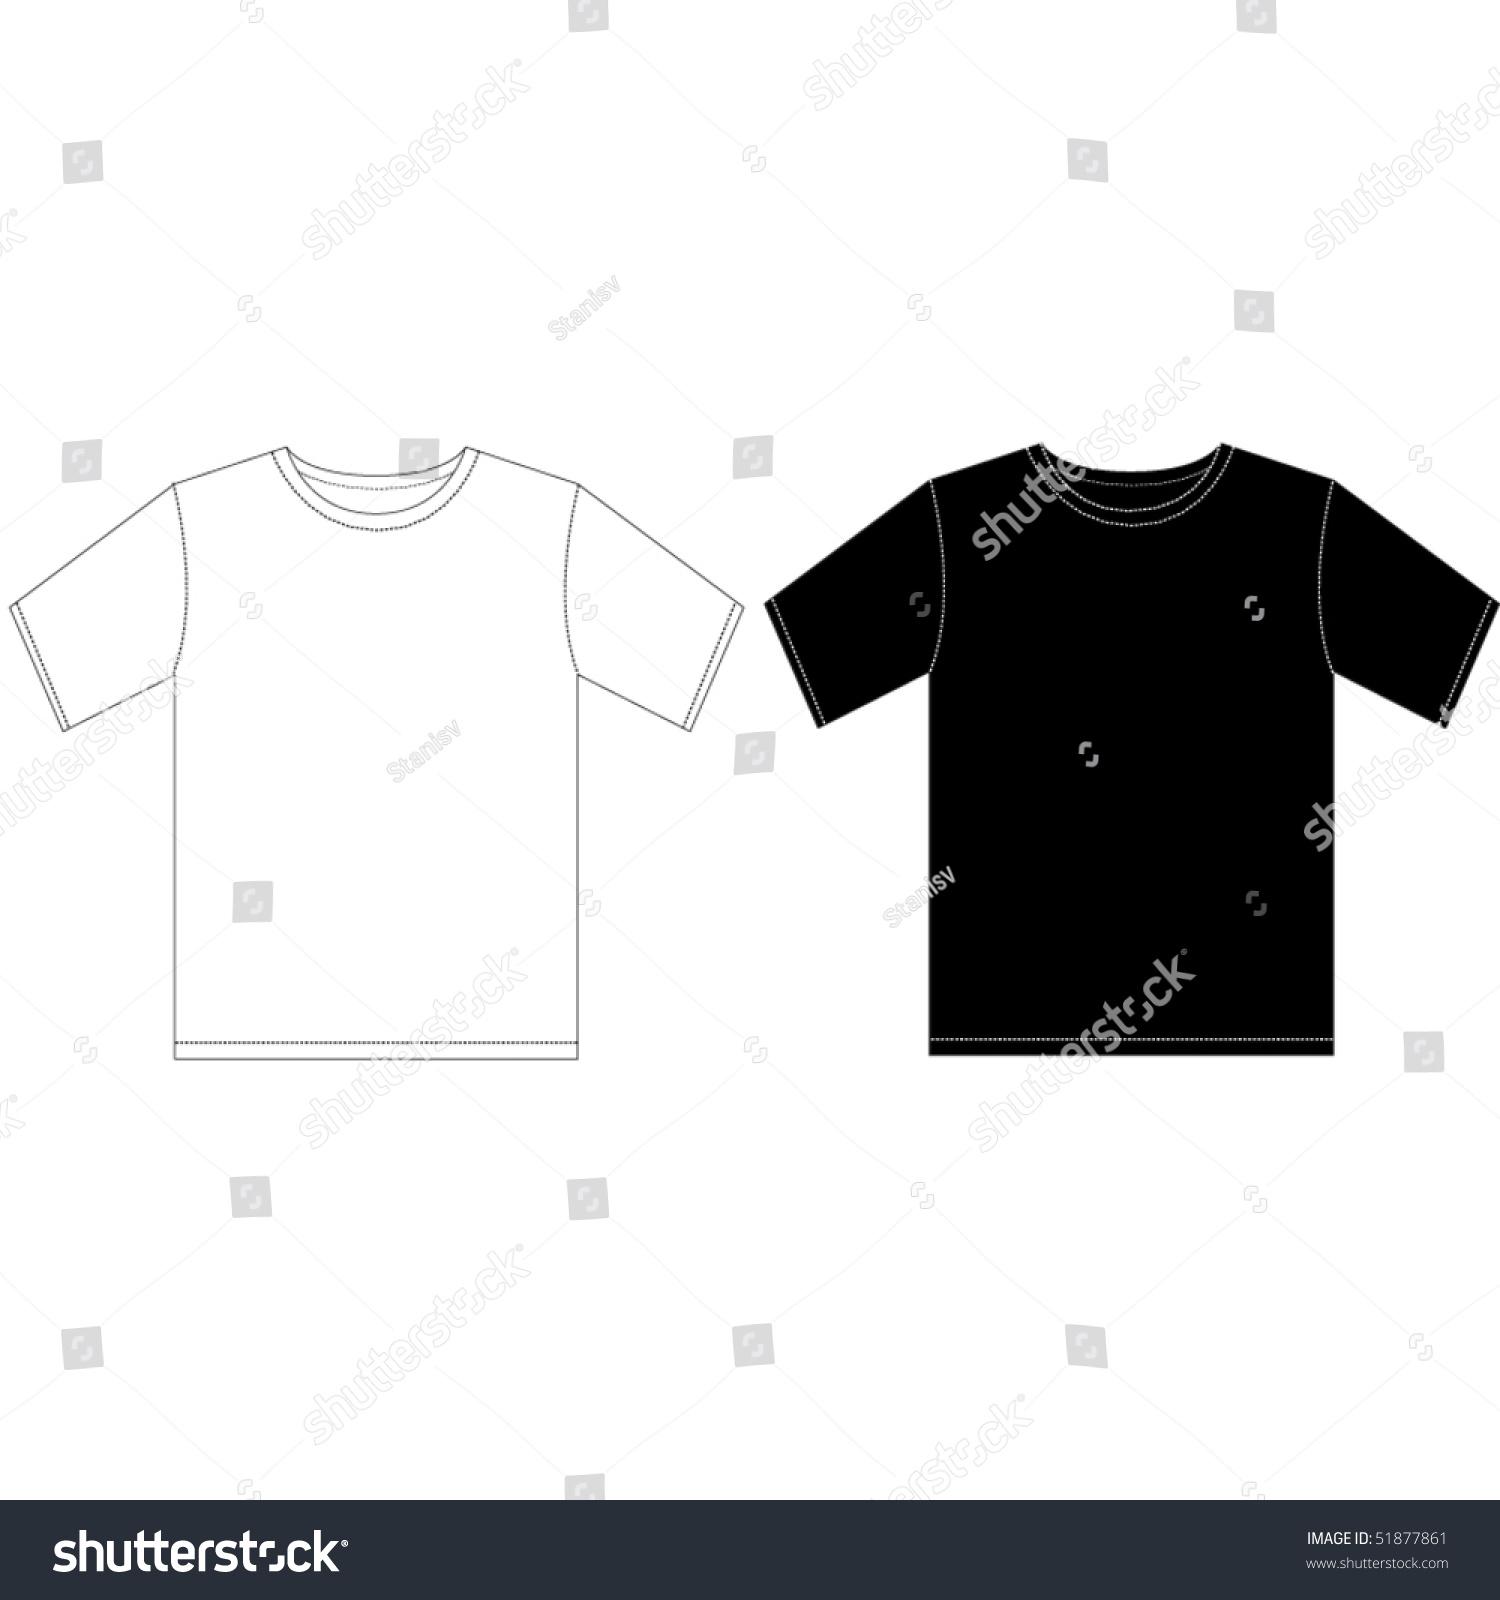 Black white man tshirt design template stock vector 51877861 black and white man t shirt design template pronofoot35fo Choice Image